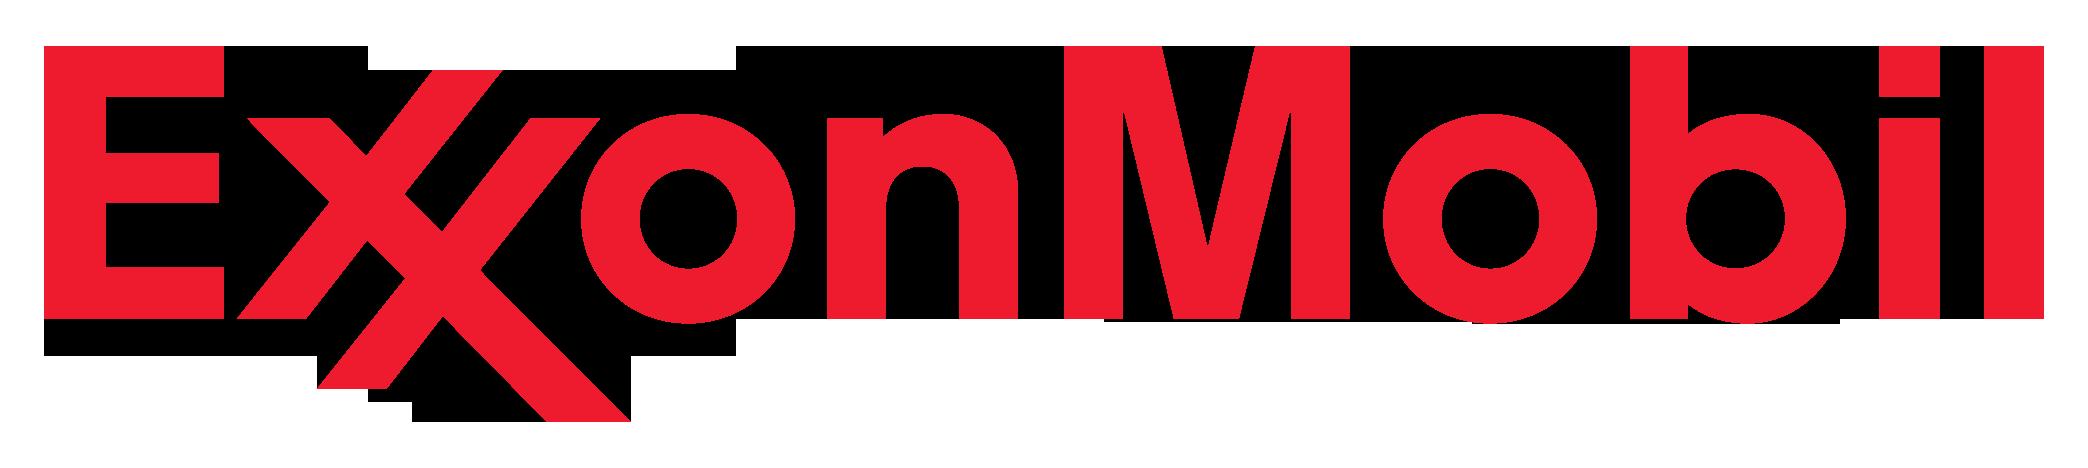 2021 Panel Sponsor - Exxon Mobile